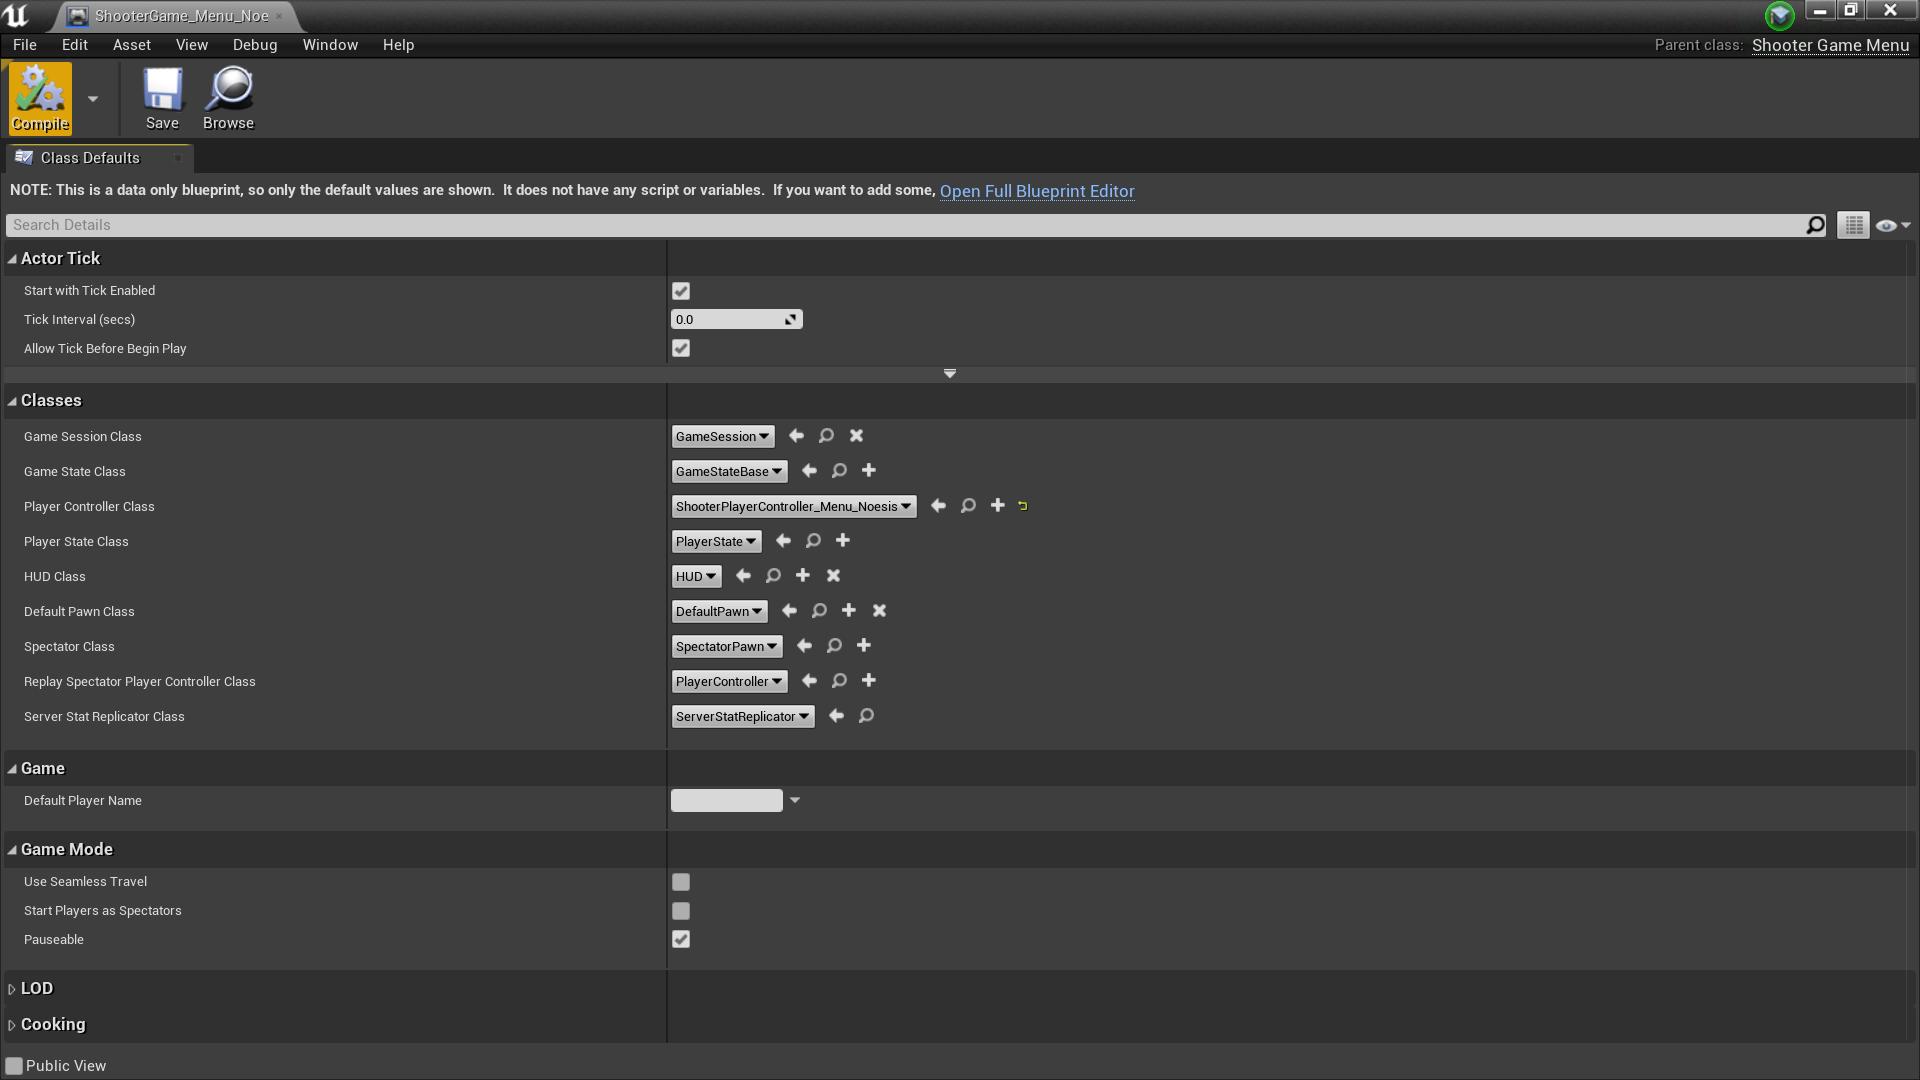 Blueprint'/Game/ShooterGame/ShooterGame_Menu_Noesis.ShooterGame_Menu_Noesis'